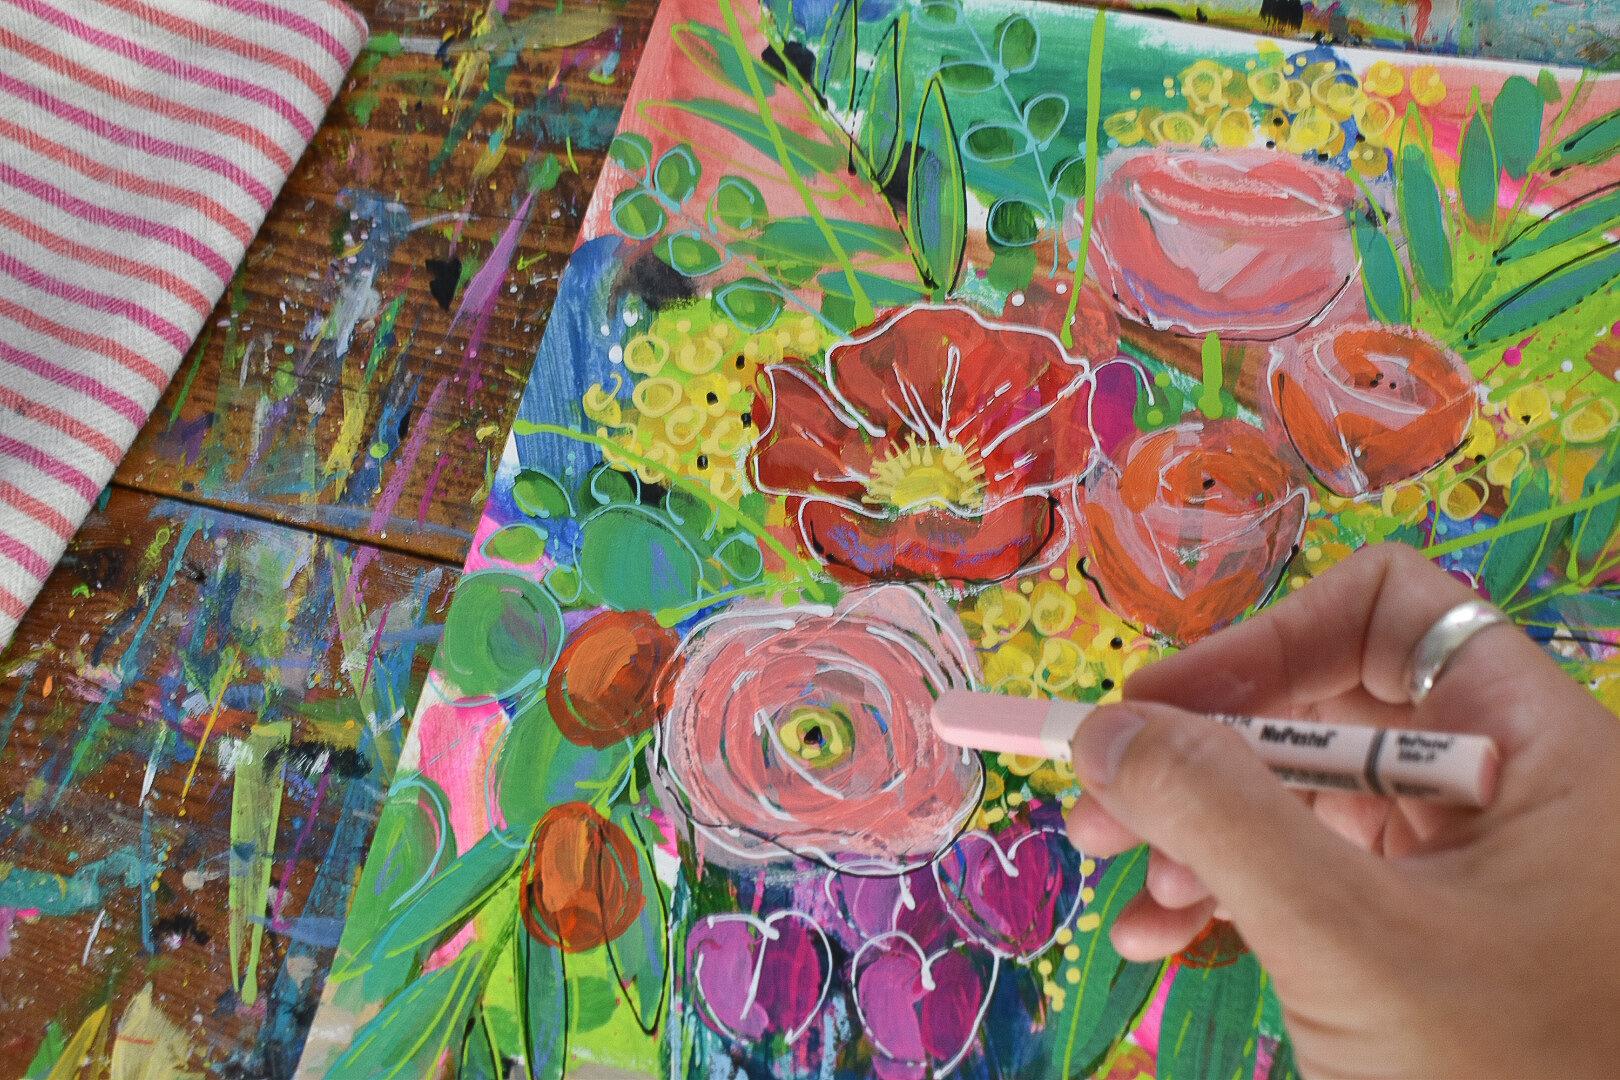 boho_flowers_painting_eclectic_tropical_daisyfaithart_5.jpg